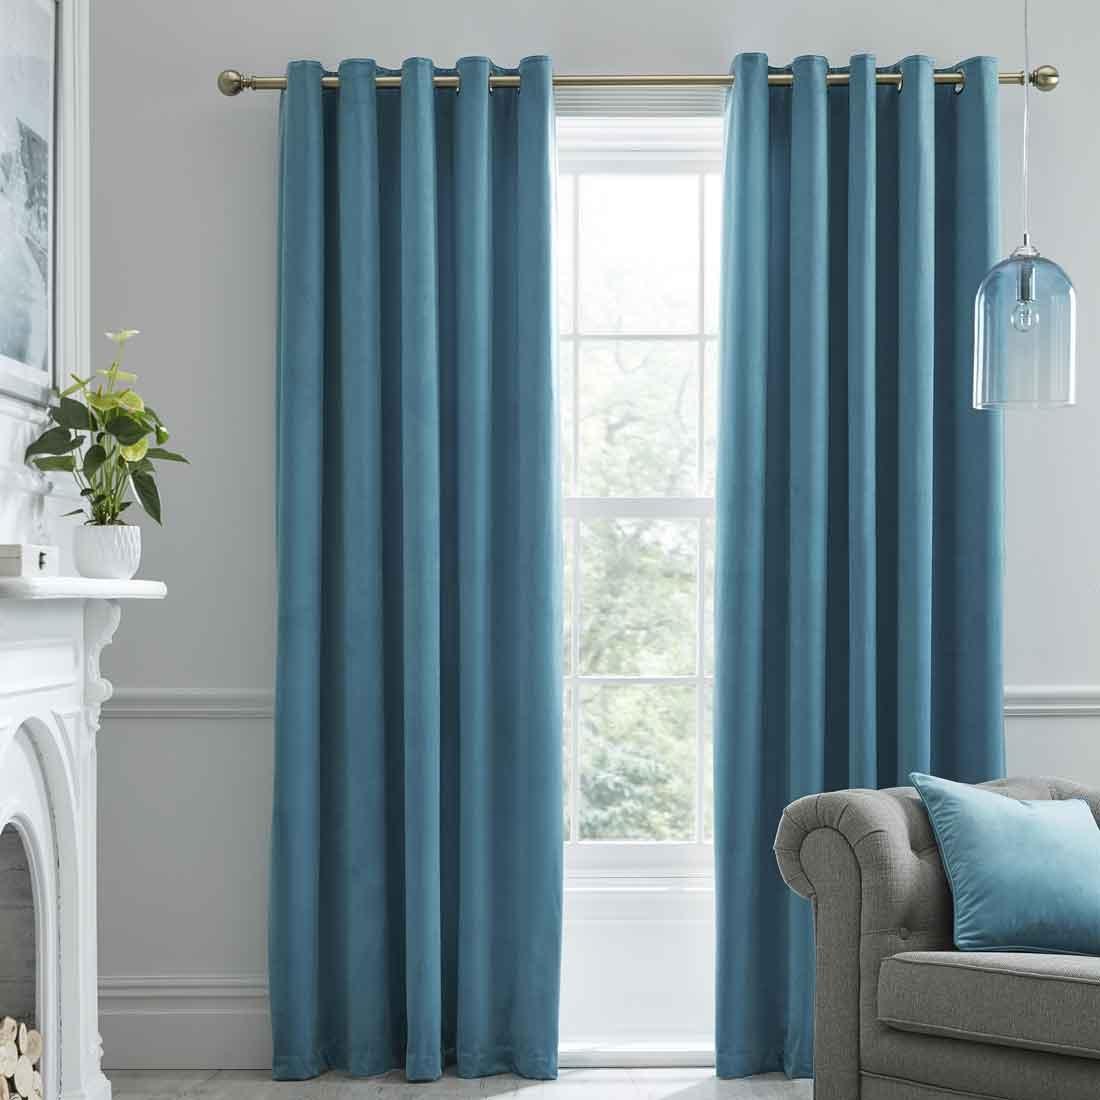 Montrose Duckegg Blackout Eyelet Curtains